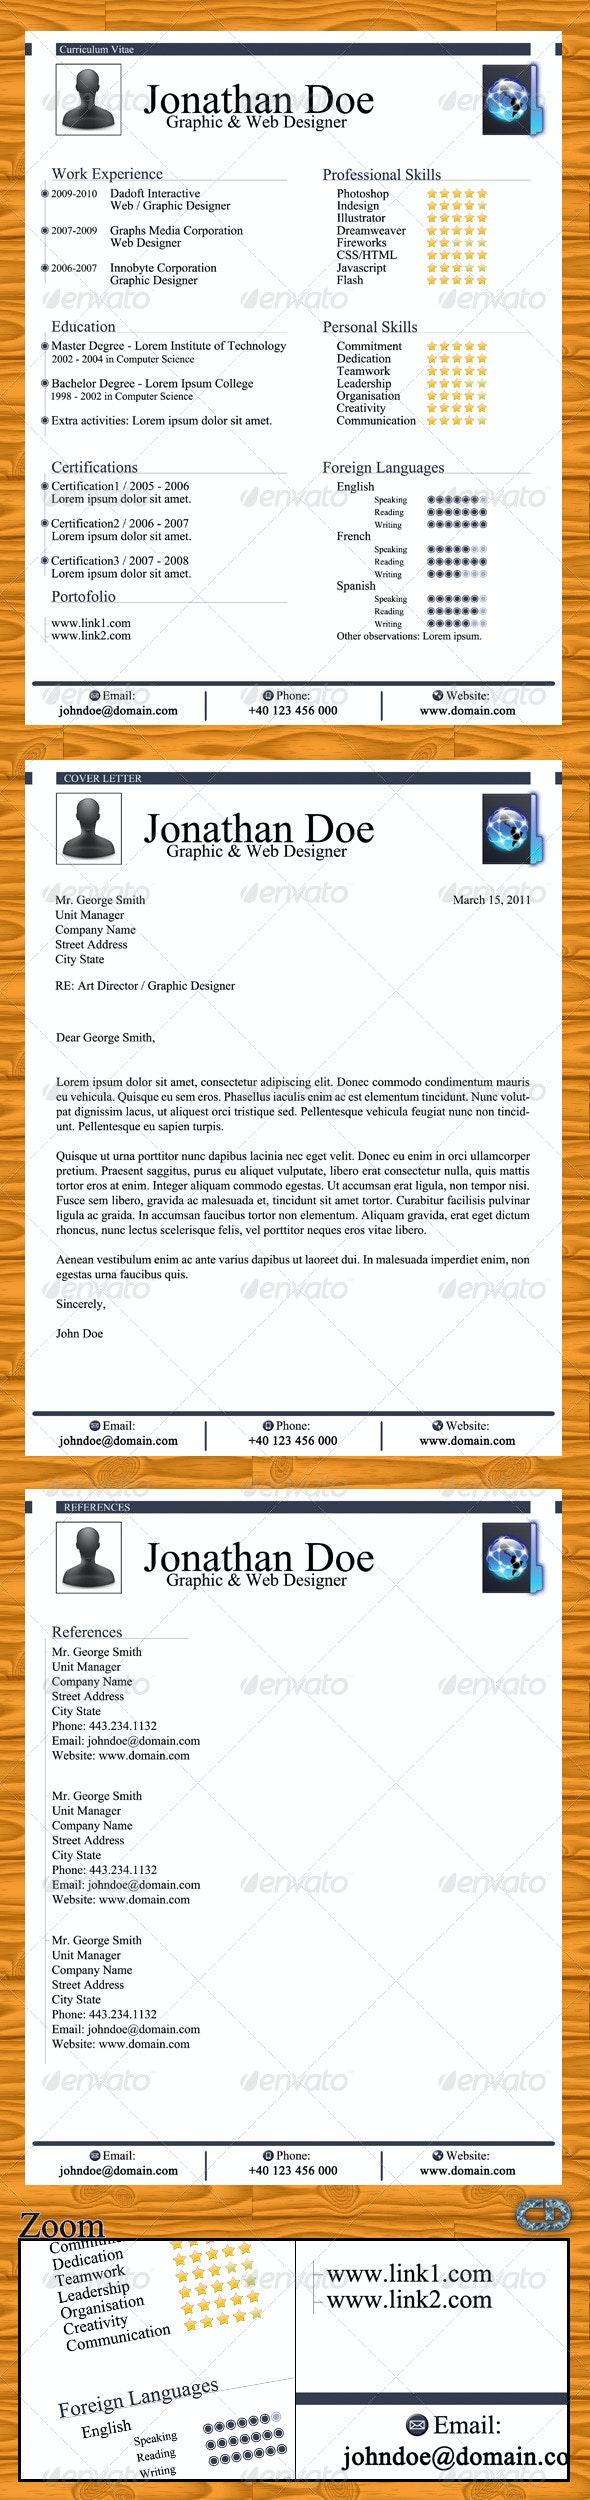 Elegant Resume + Cover Letter + References - Resumes Stationery